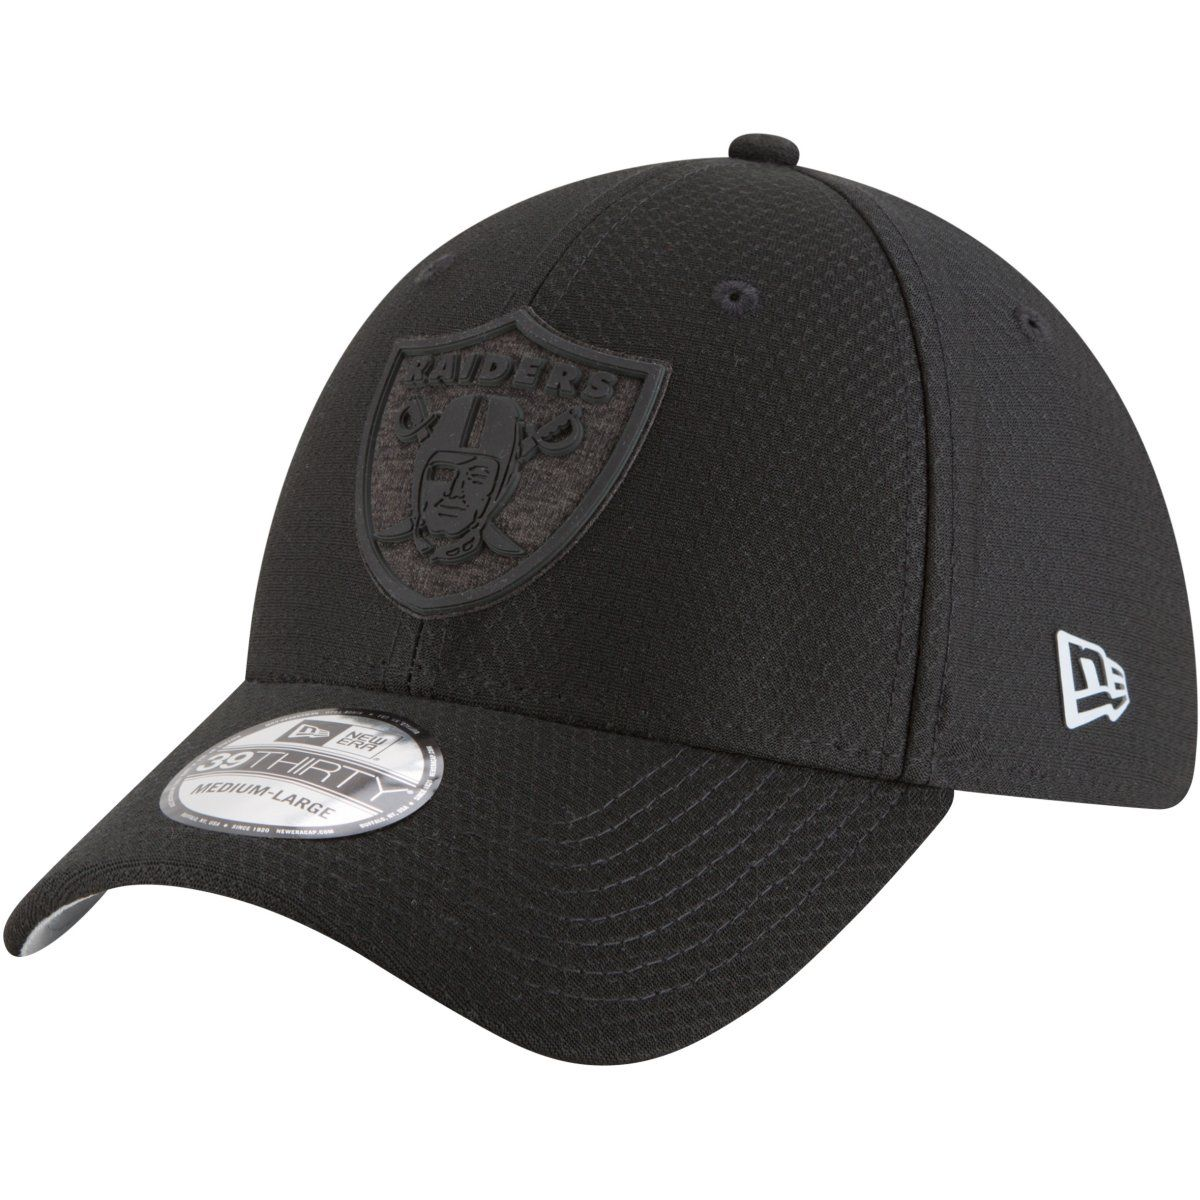 amfoo - New Era 39Thirty Cap - TRAINING Oakland Raiders